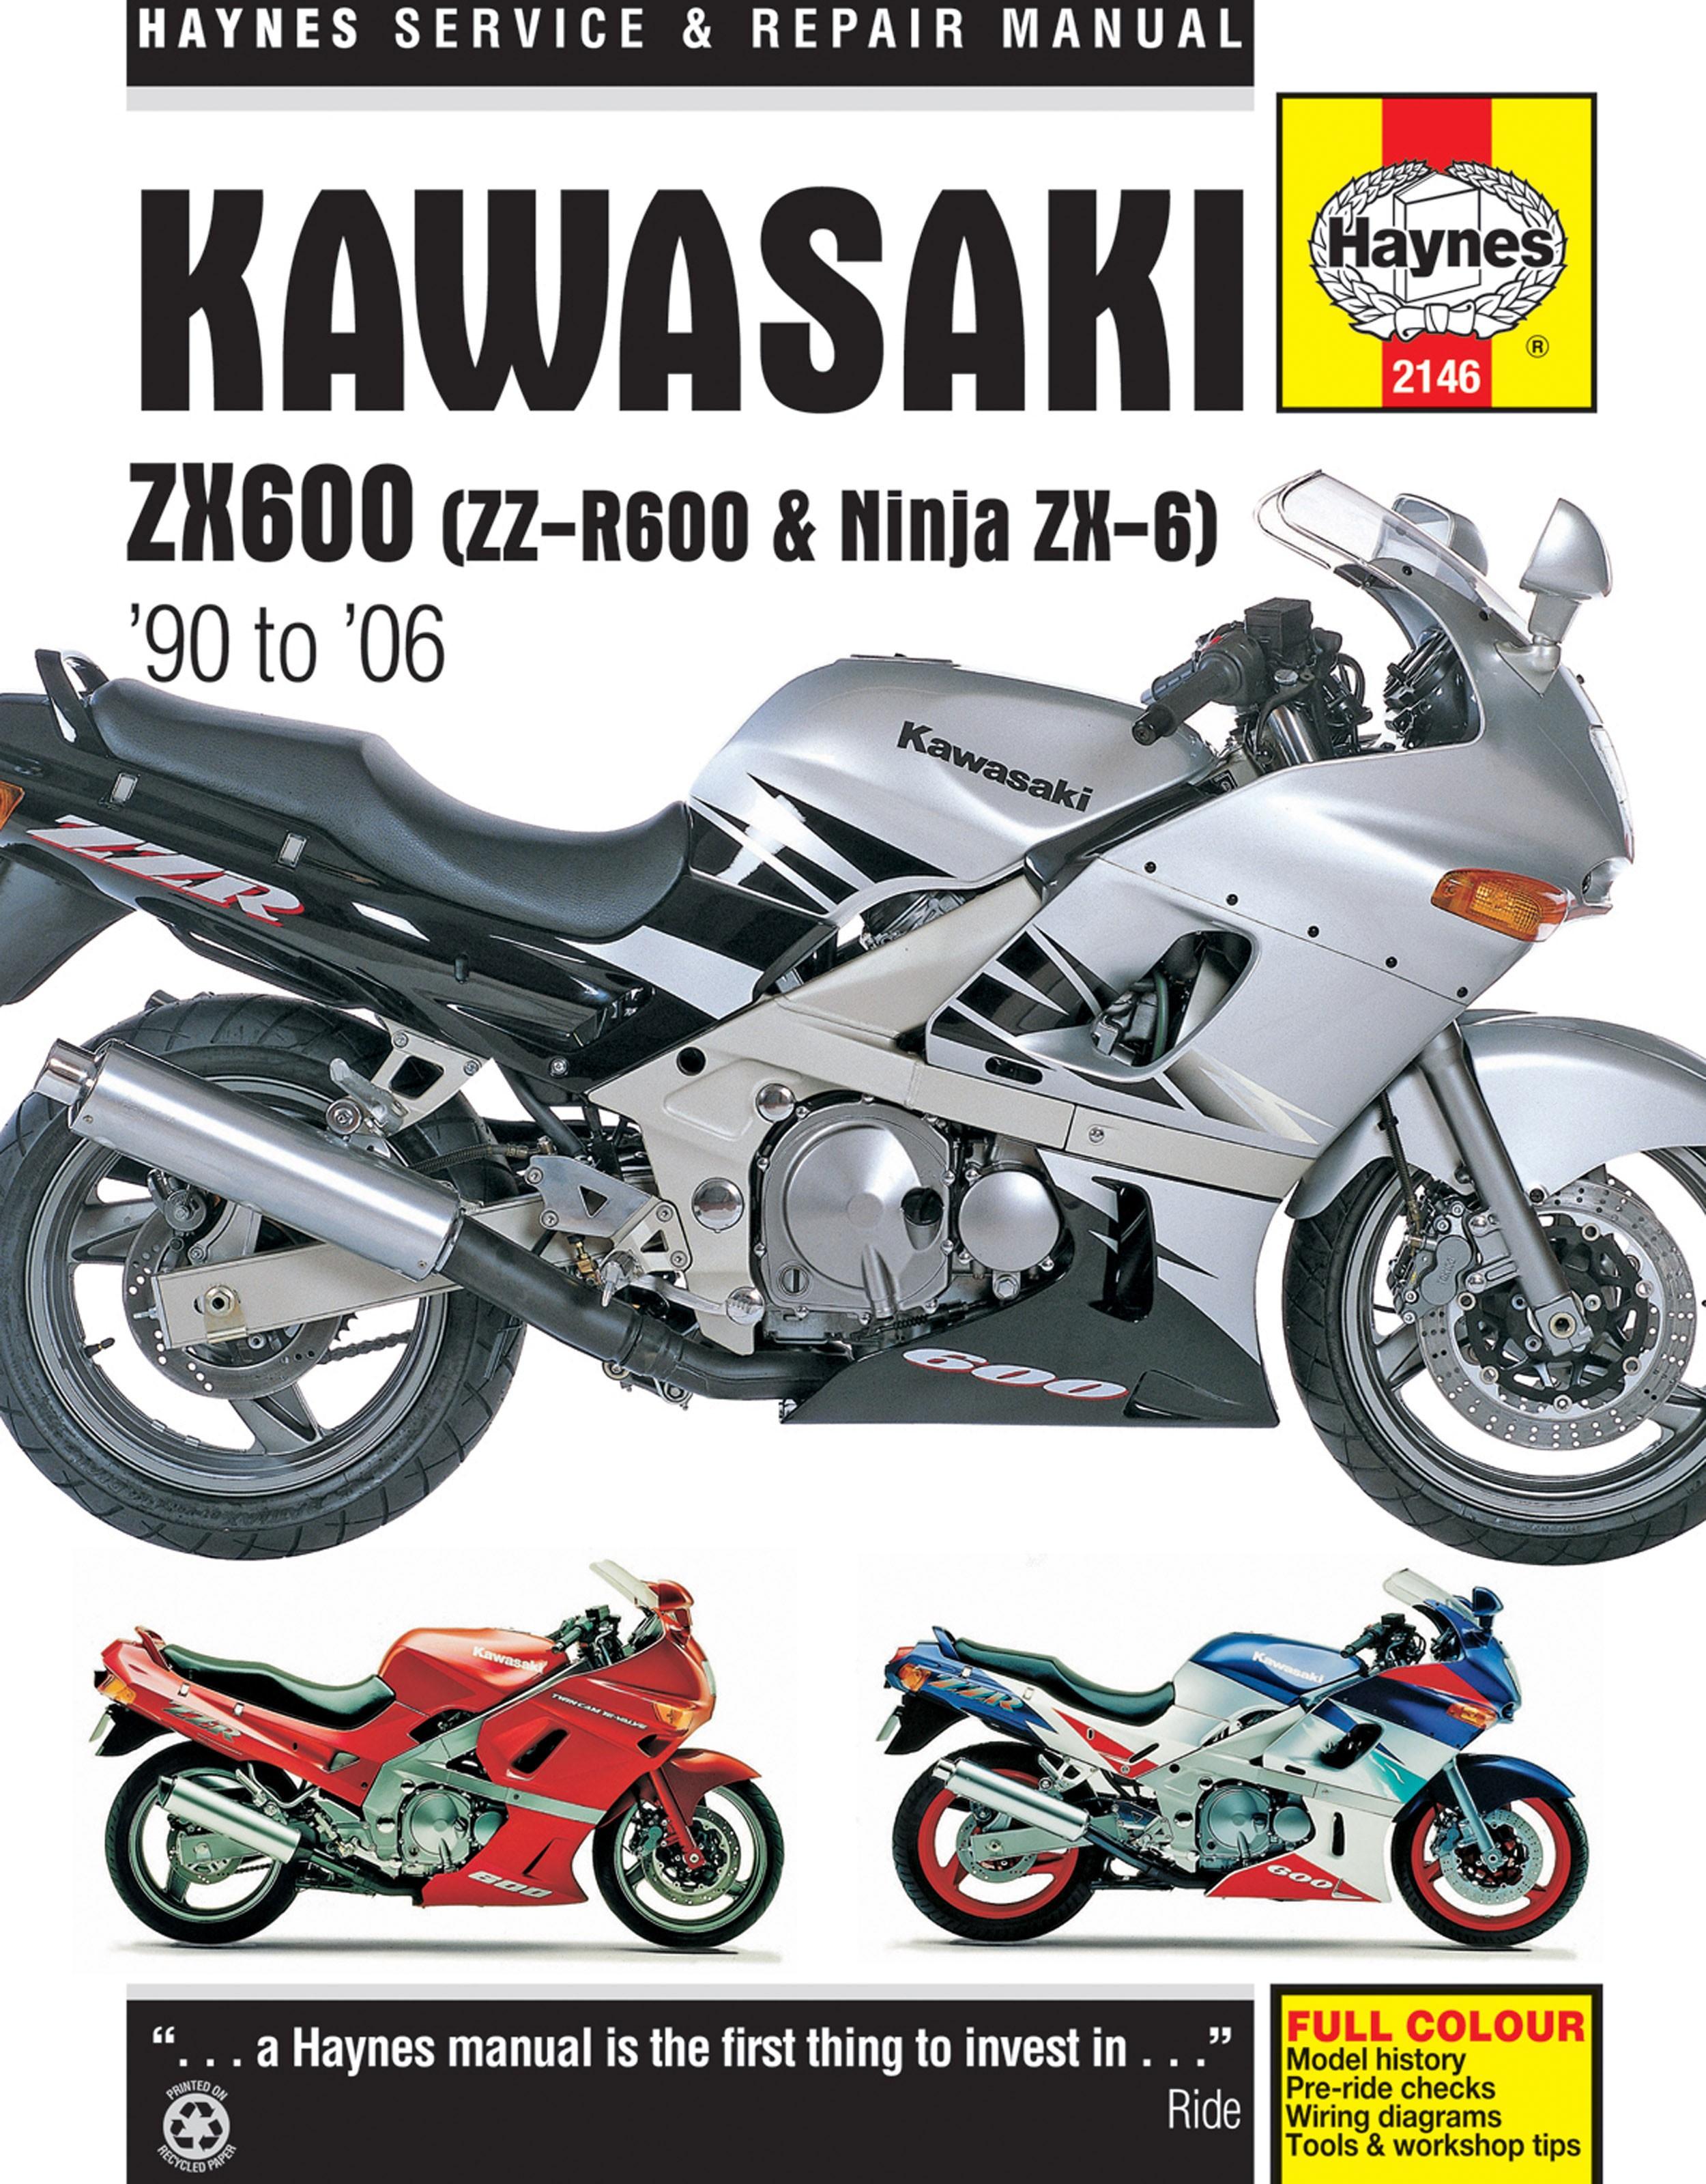 HAYNES Repair Manual - Kawasaki ZX600 ZZ-R600 and Ninja ZX-6 (1990-2004)